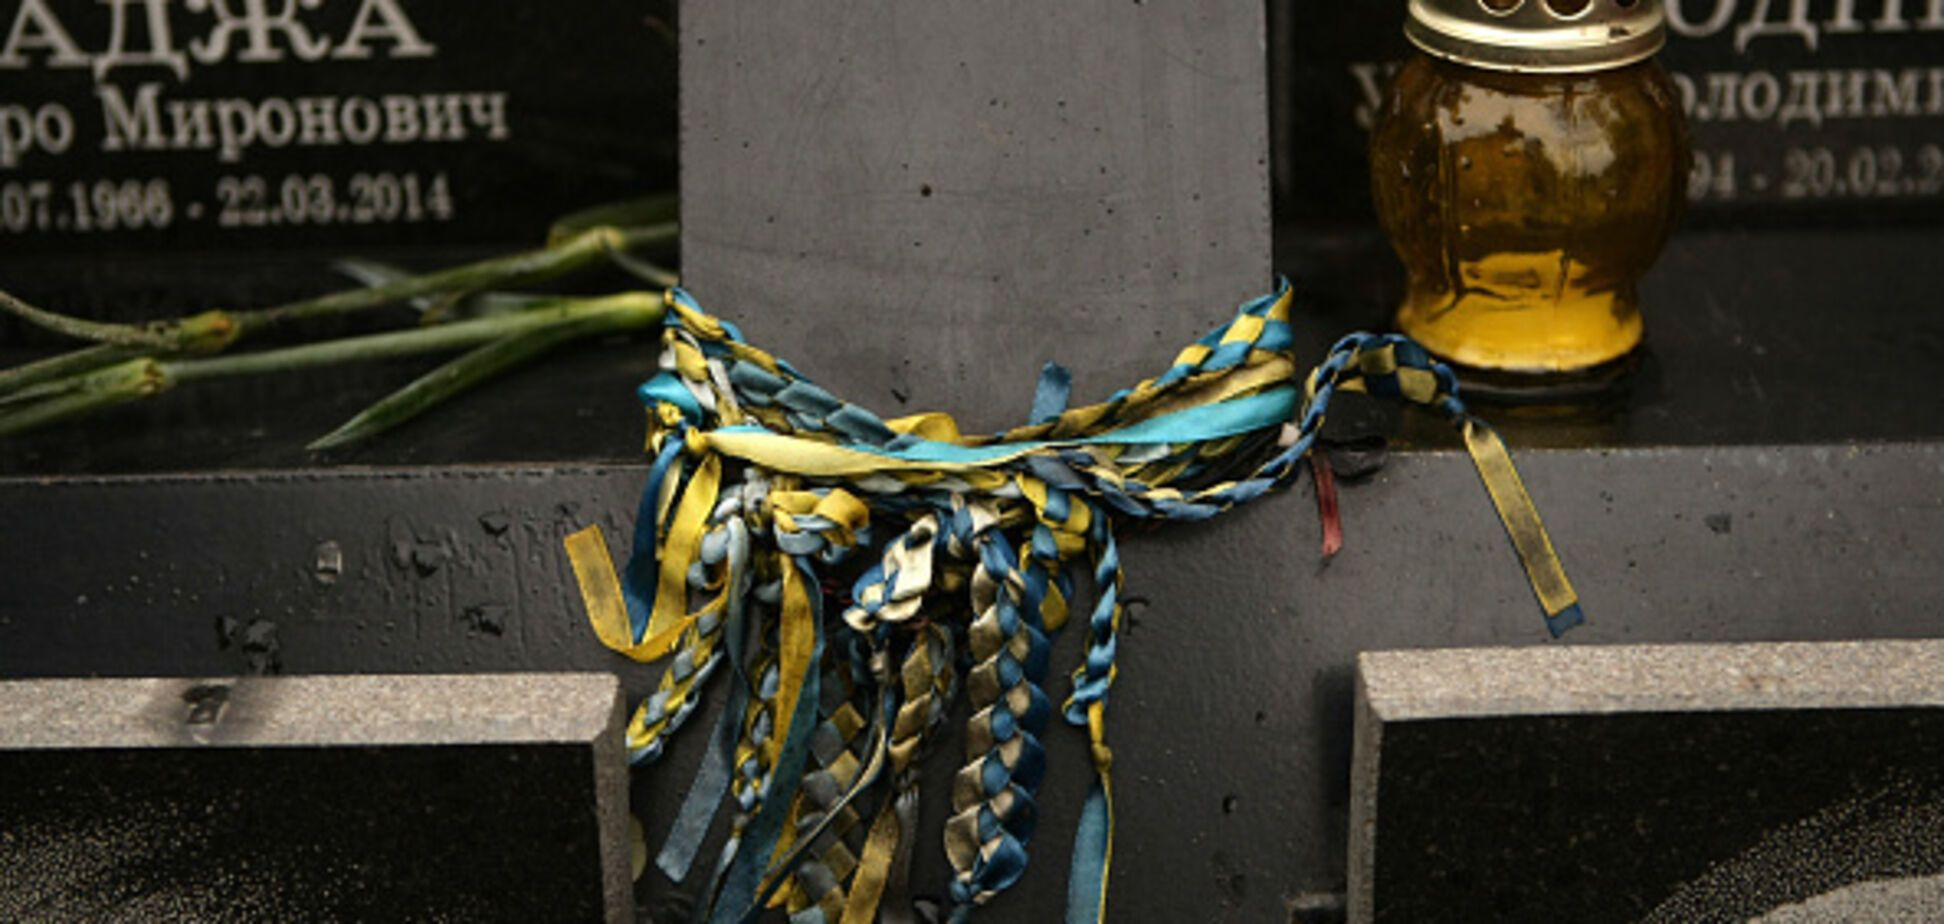 Пам'ятний знак на честь Євромайдану